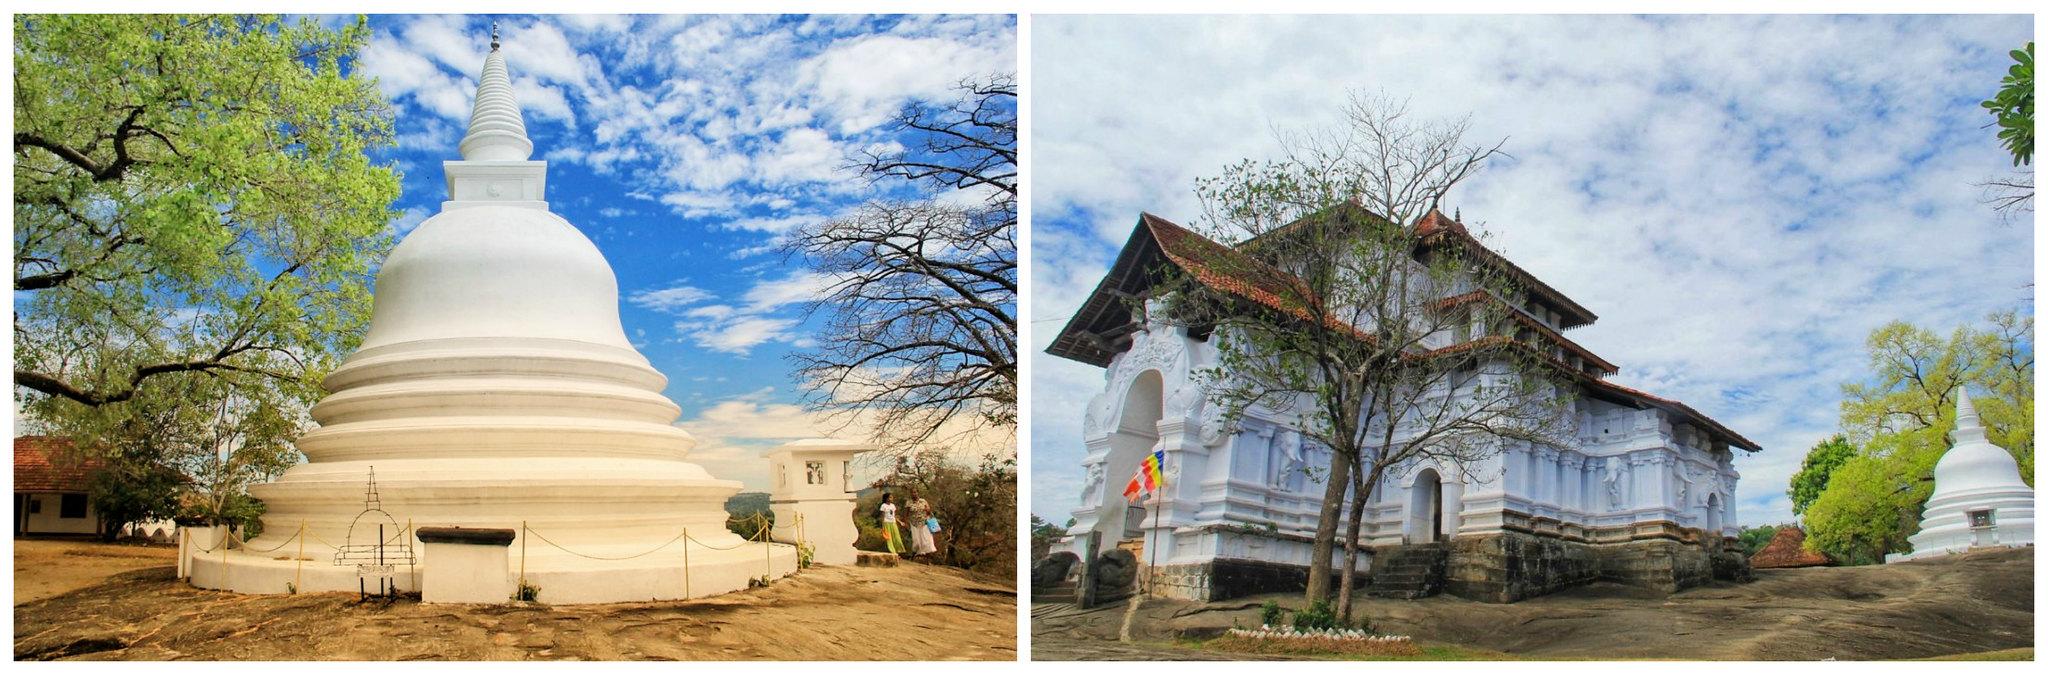 Lankatilake Temple, Kandy